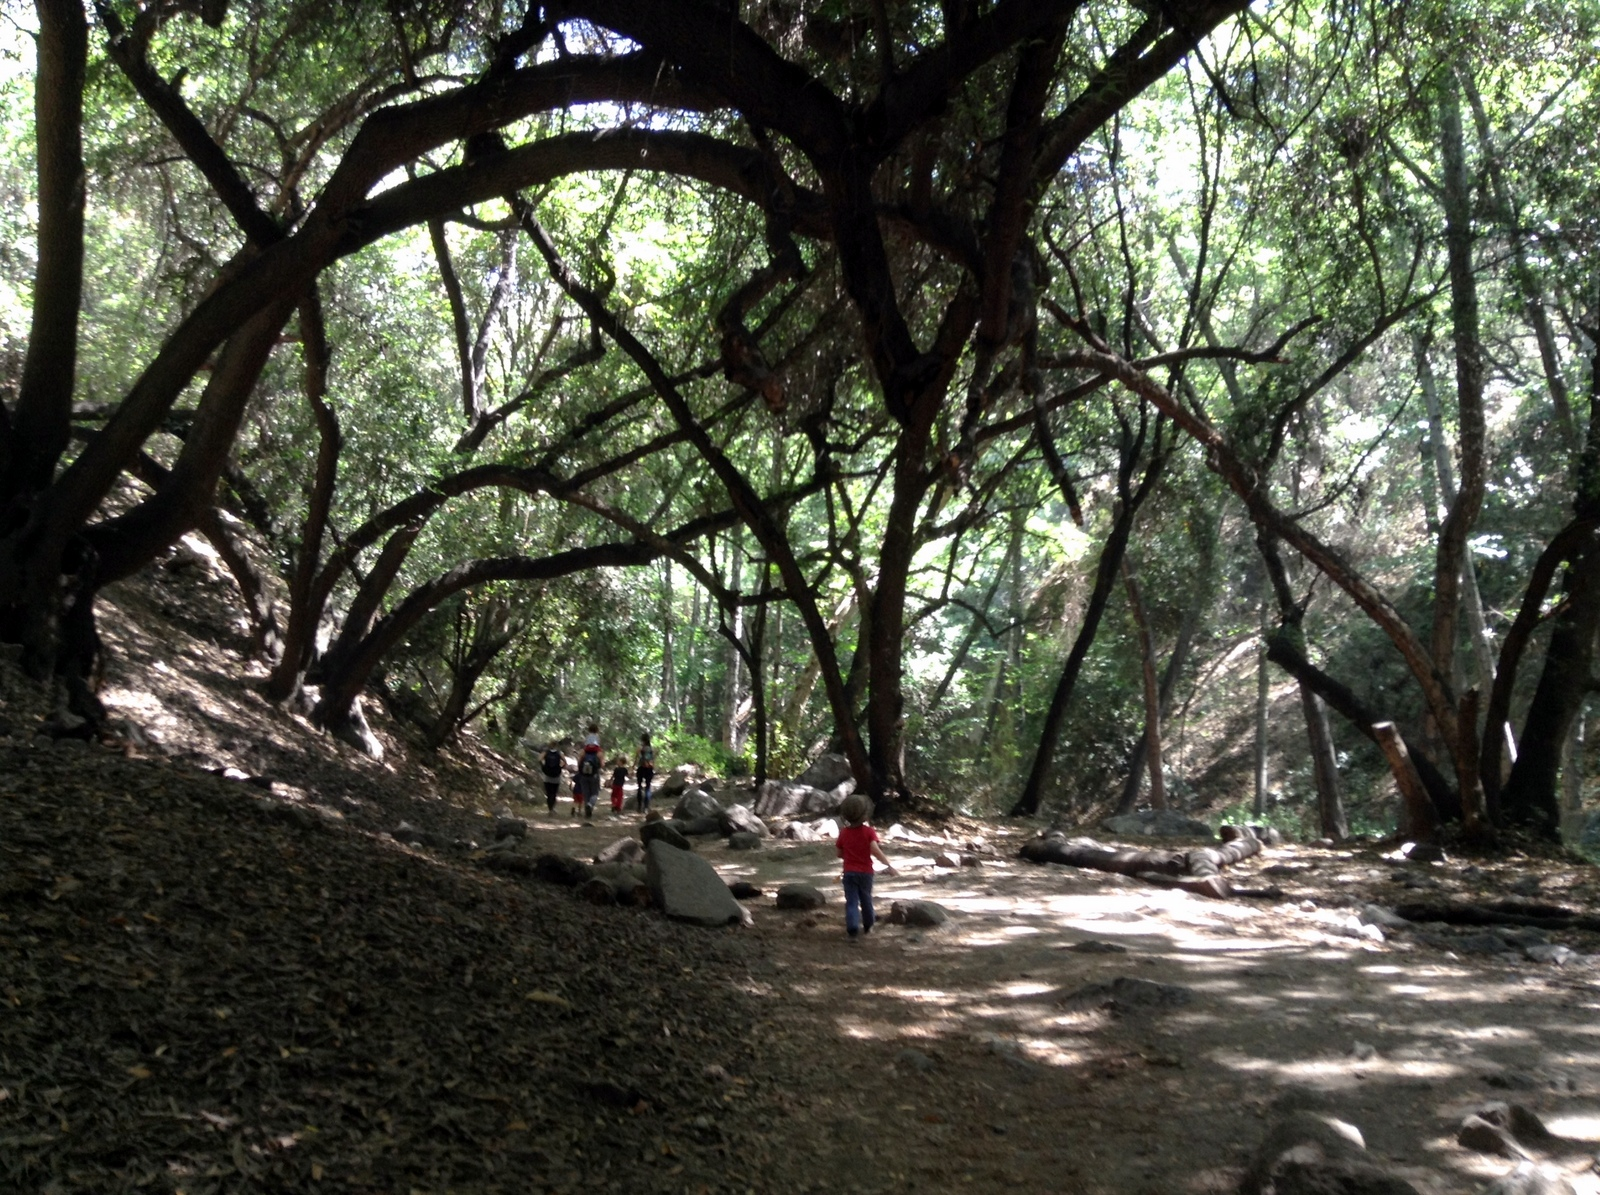 Monrovia Canyon Falls: The Perfect Family Hike